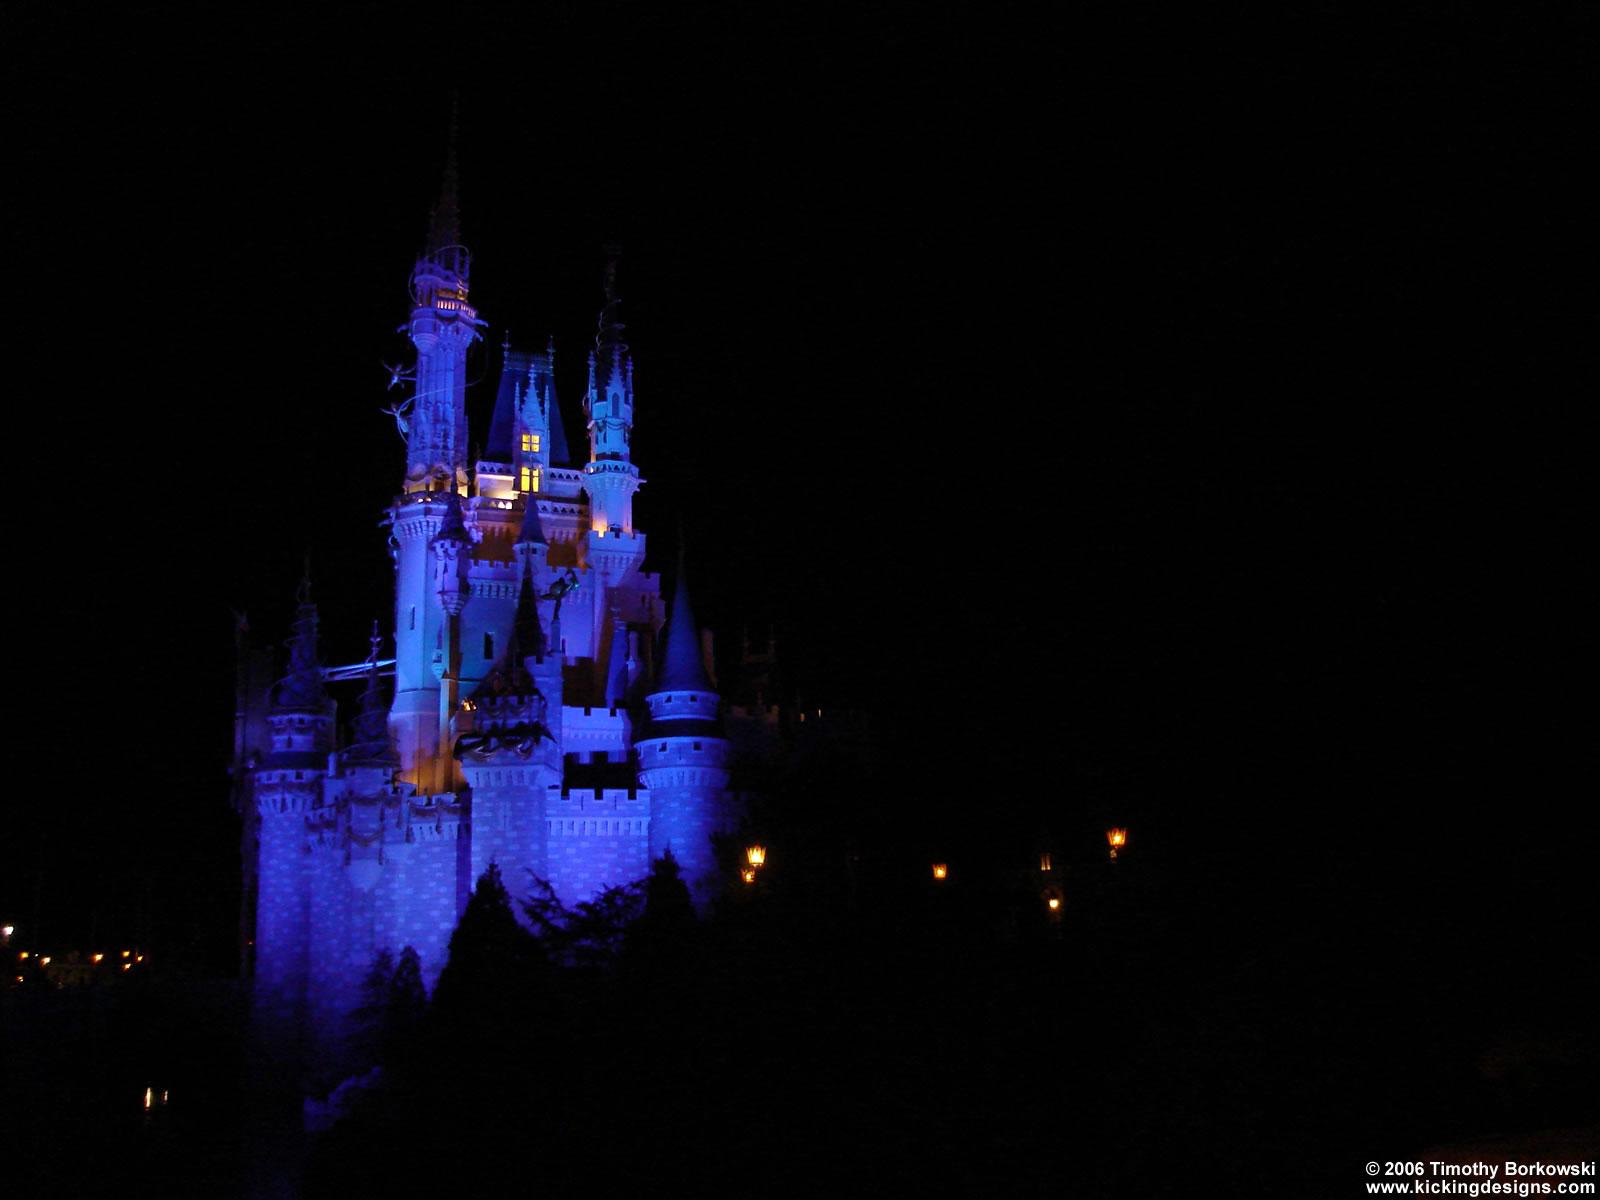 Go Back Pix For Disney Castle At Night Wallpaper 1600x1200